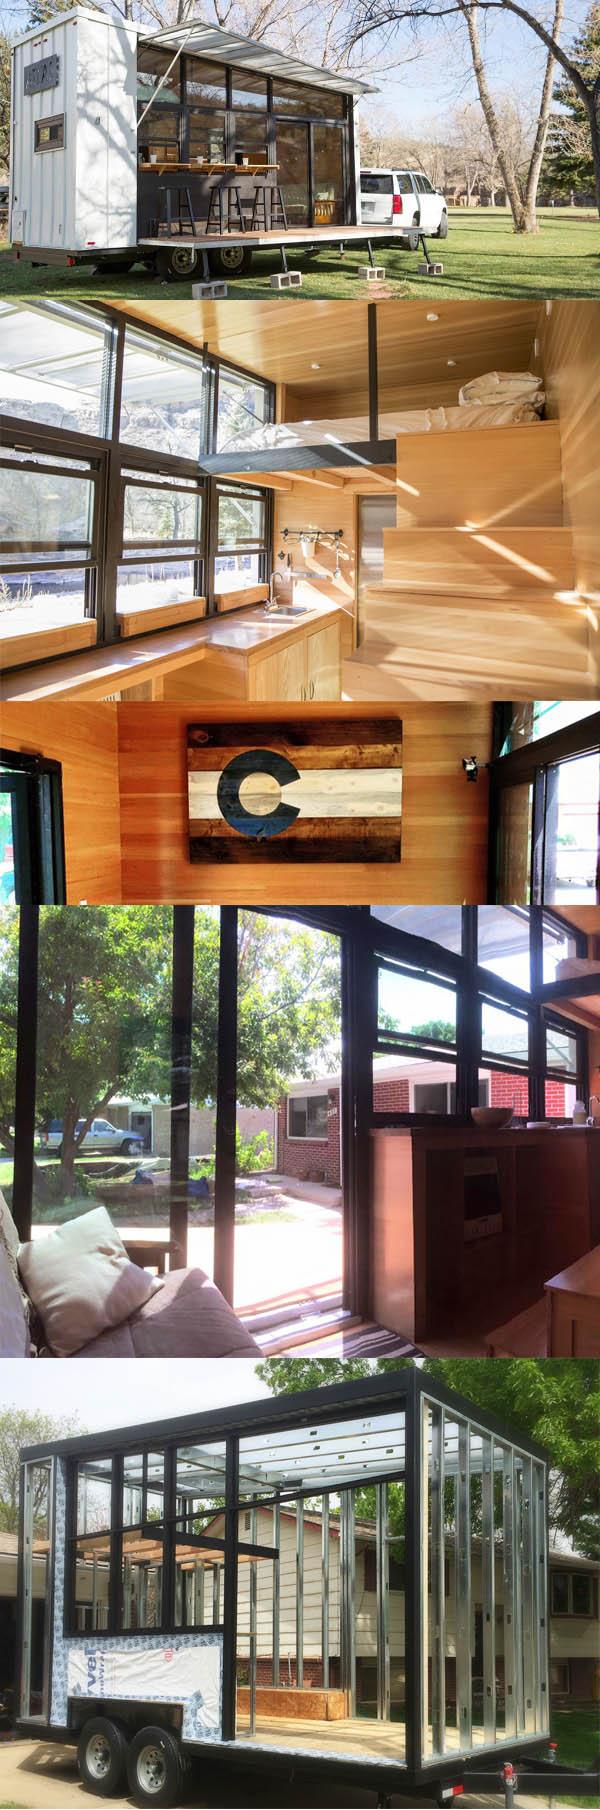 Terra Sophia, Tiny House - maison minuscule remorque